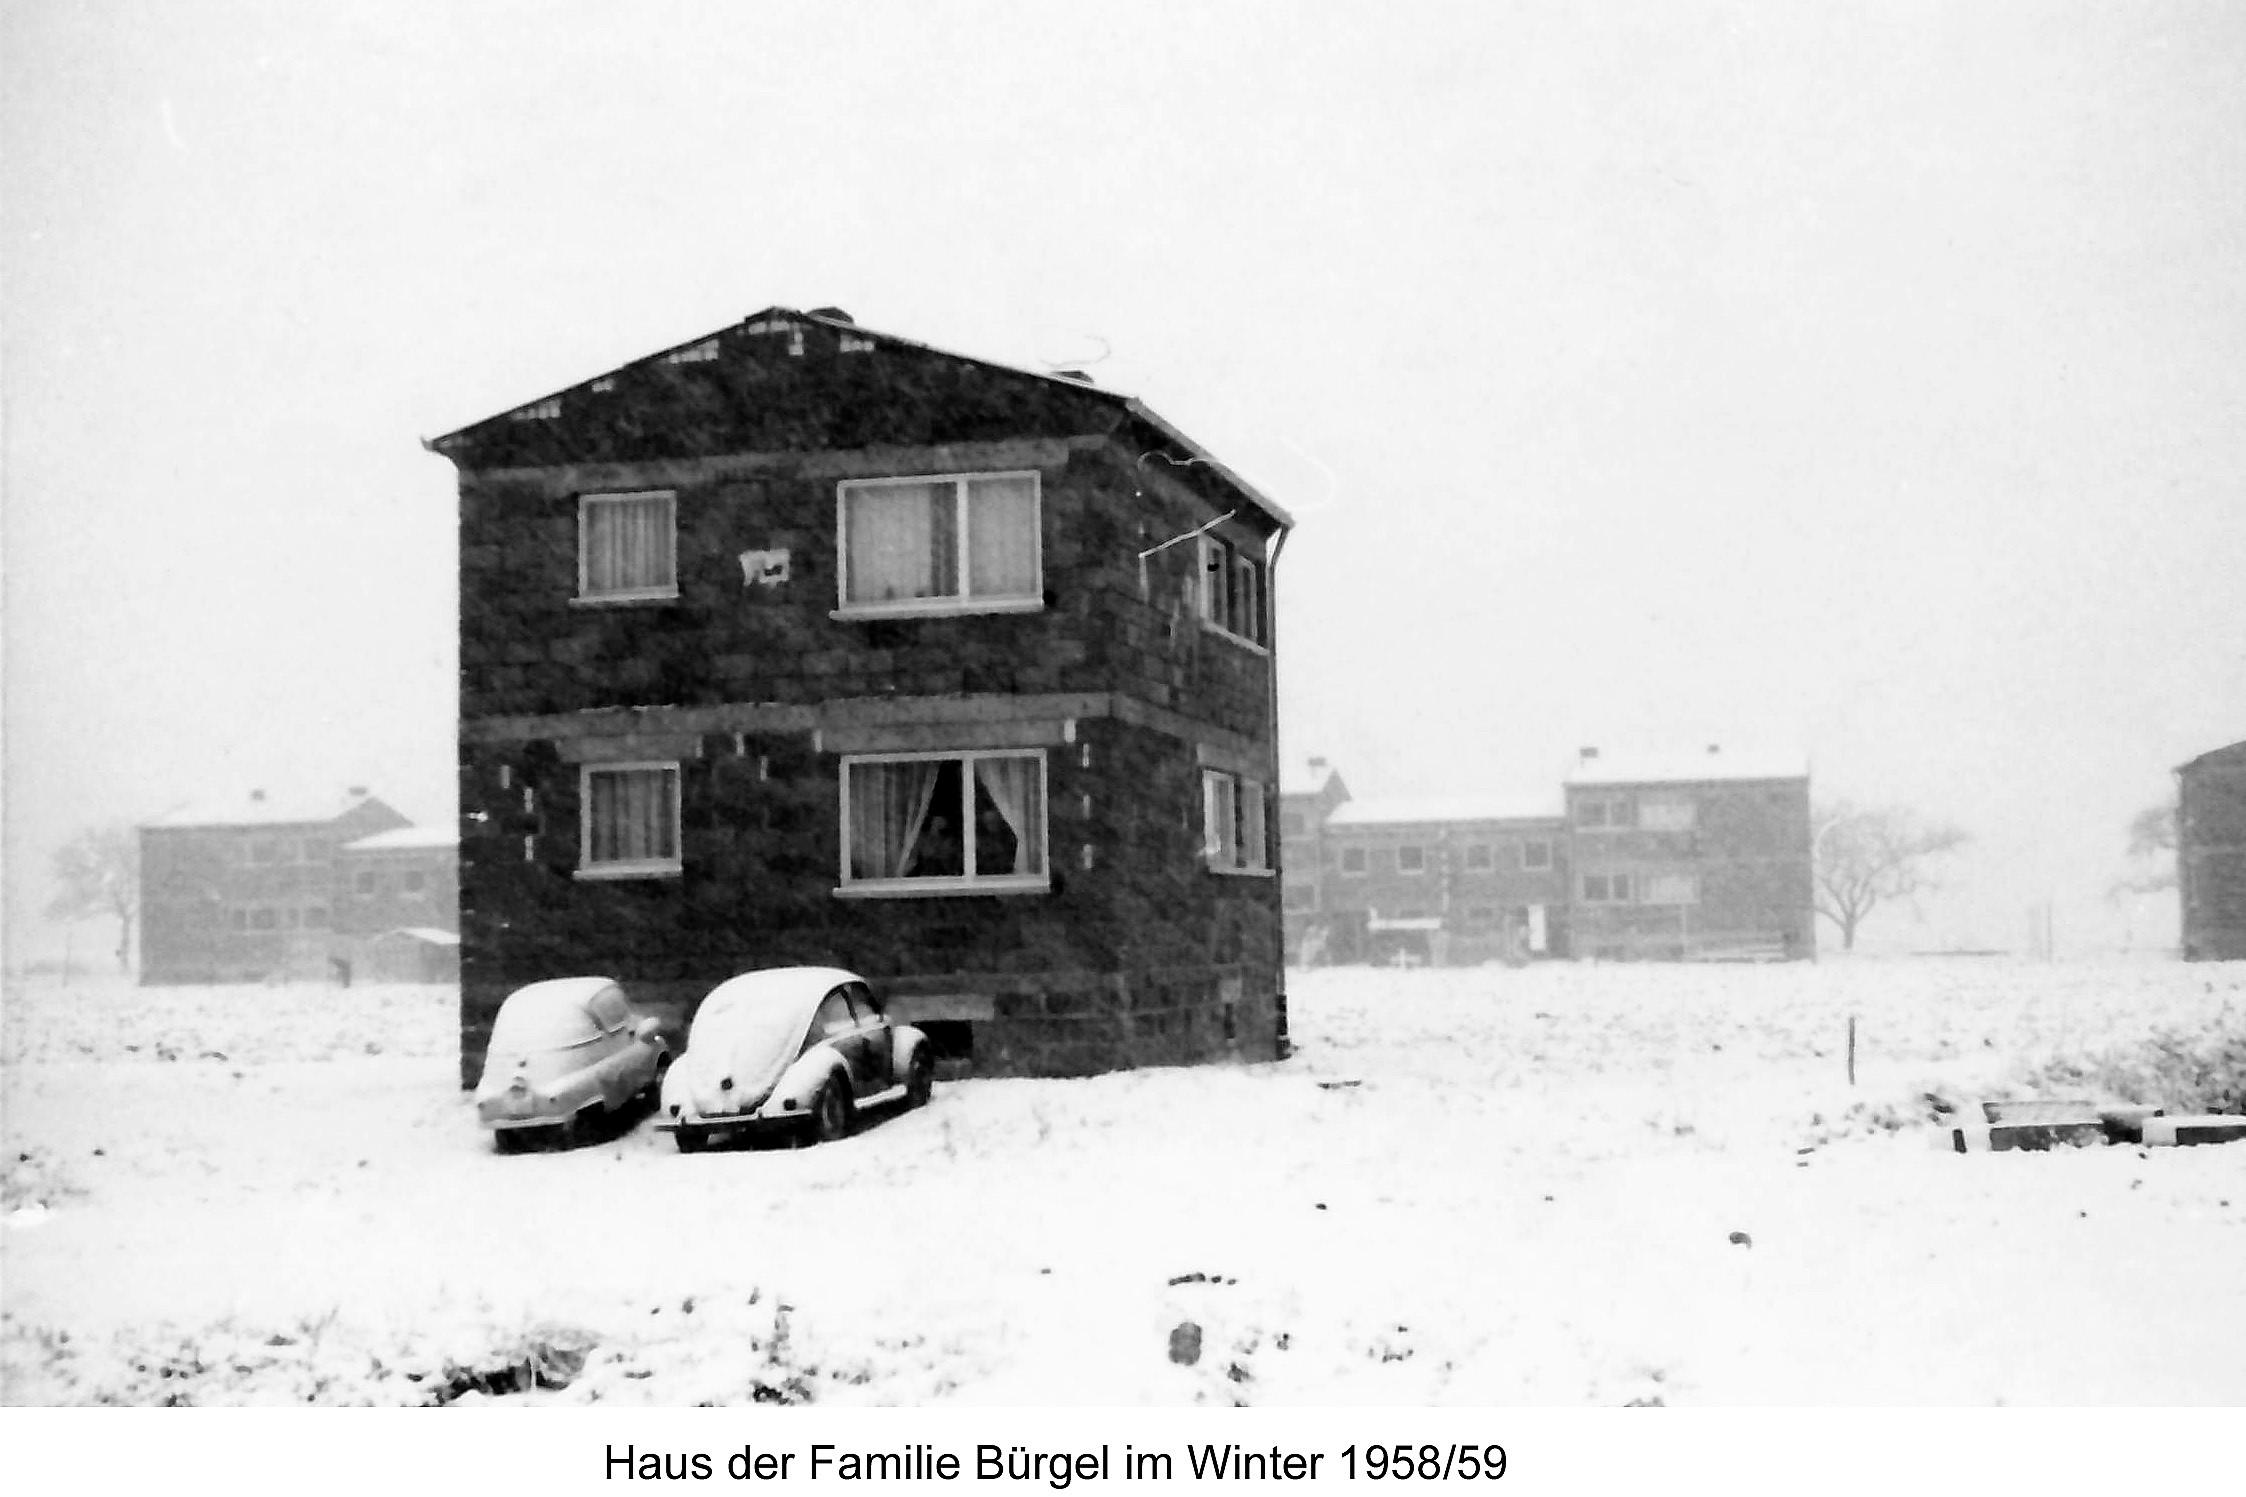 Fam. Bürgel 1958